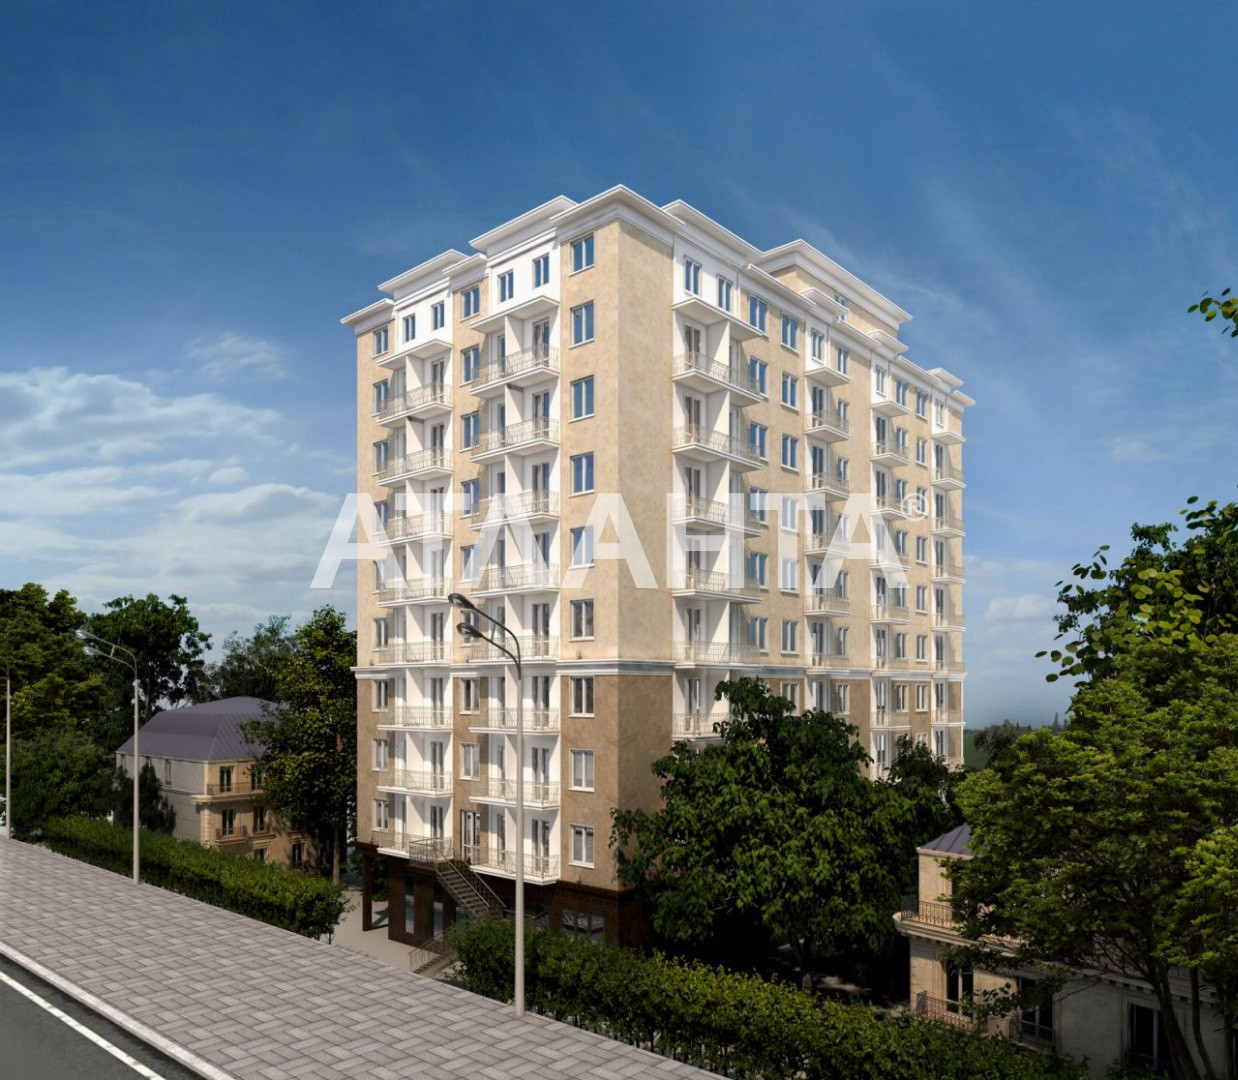 Продается 1-комнатная Квартира на ул. Балковская (Фрунзе) — 17 550 у.е. (фото №2)